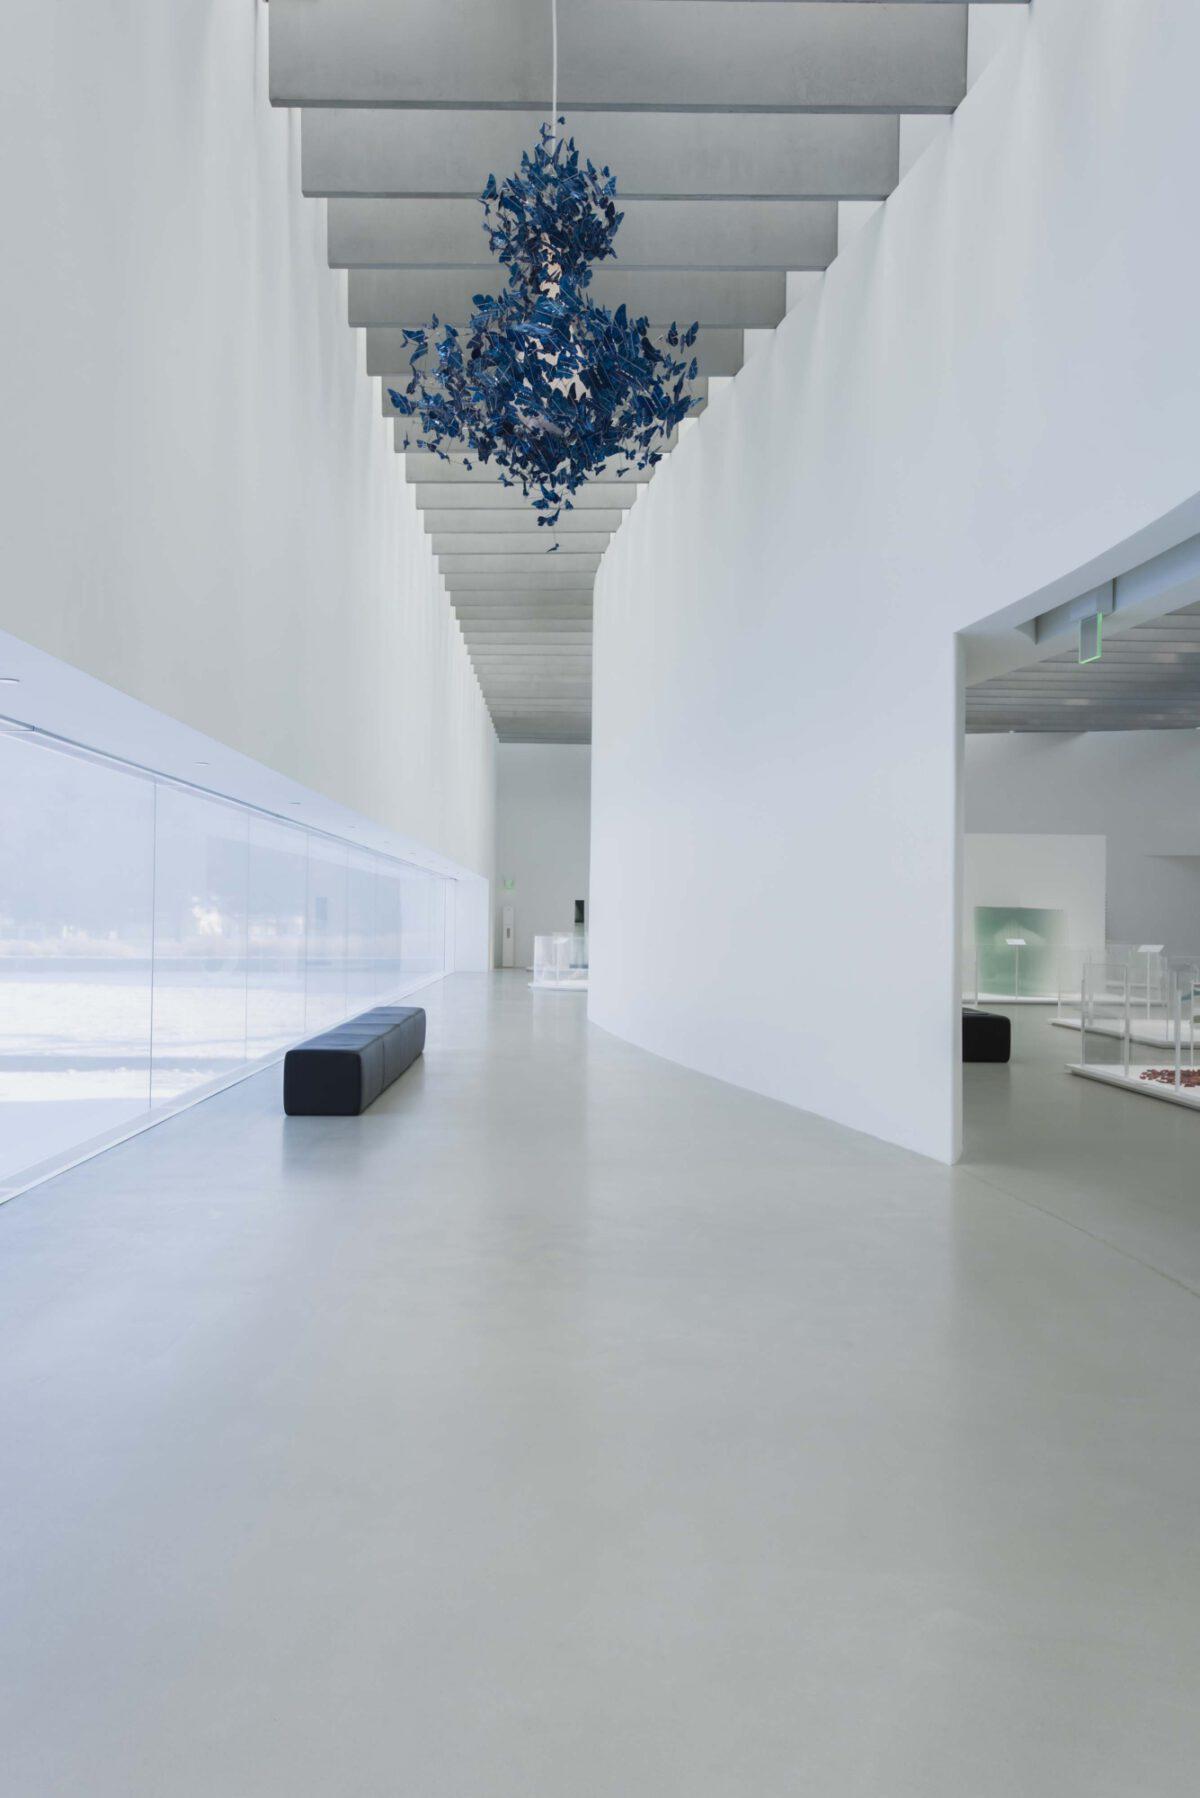 Jeroen Verhoeven Virtue Of Blue 2010 Installation View Corning Museum Of Glass